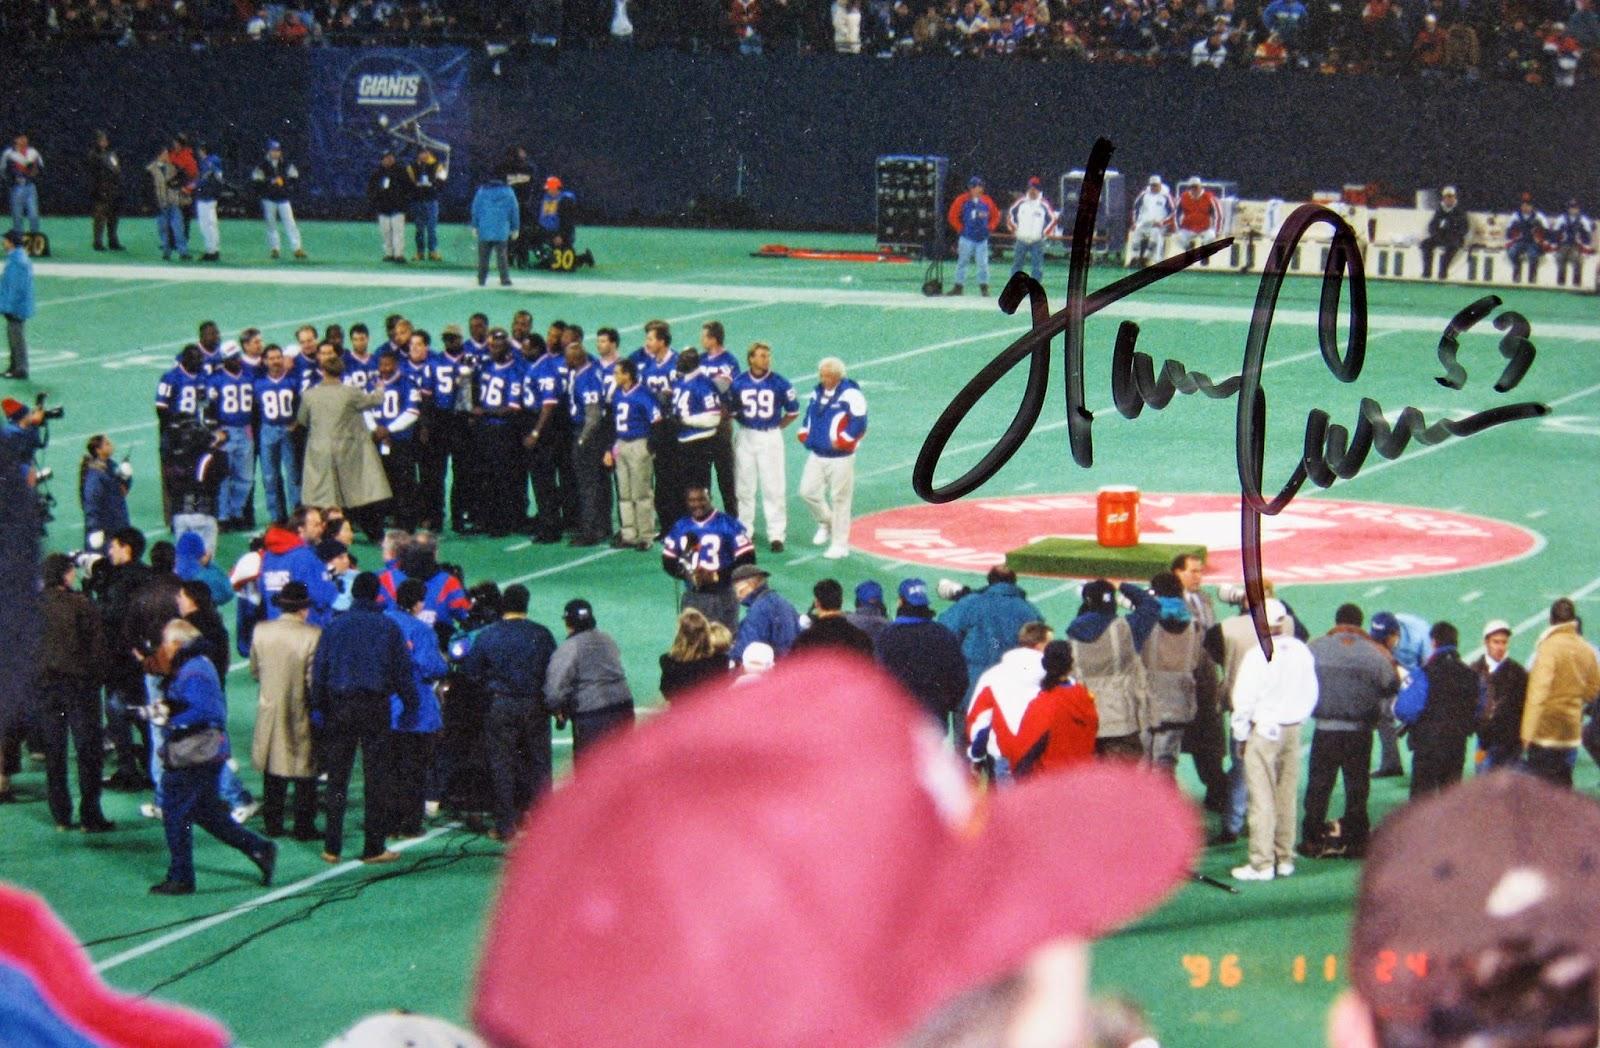 Harry Carson & 1986 Superbowl team at 10 year reunion Giants stadium 1996